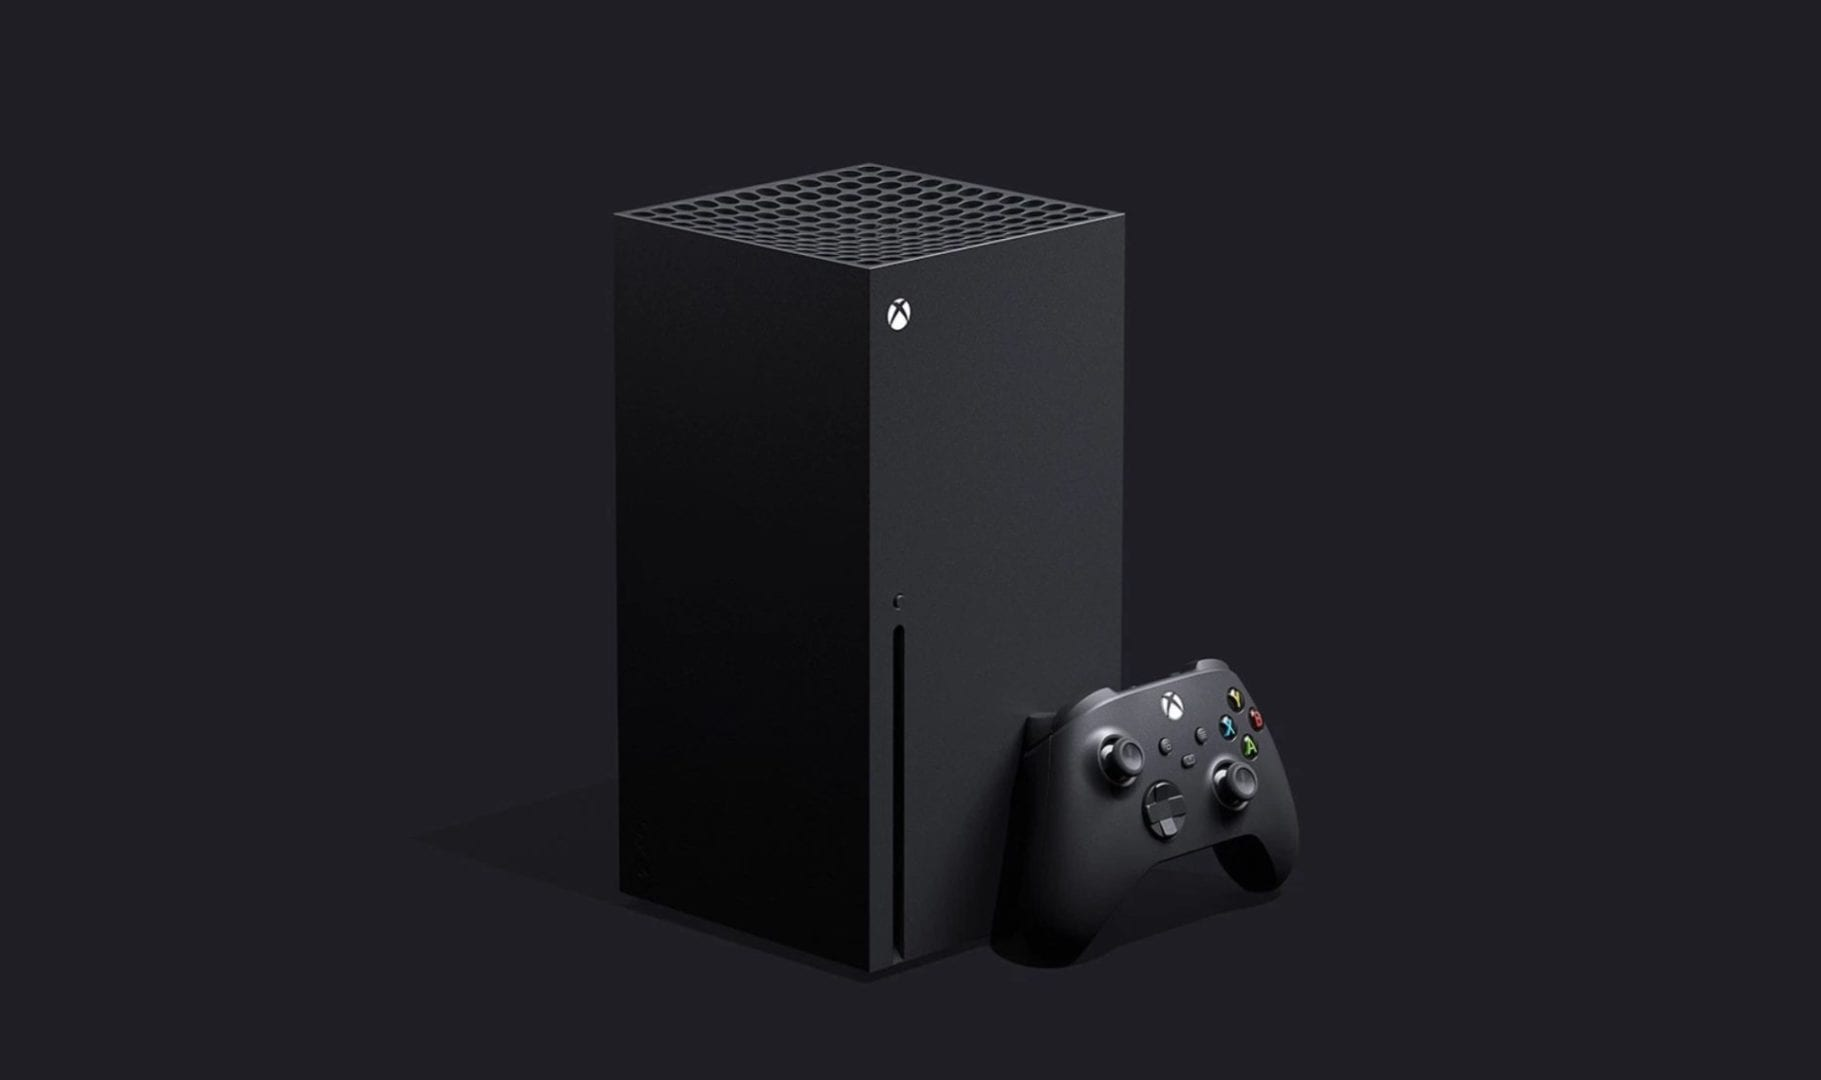 microsoft, xbox series x, next-gen console